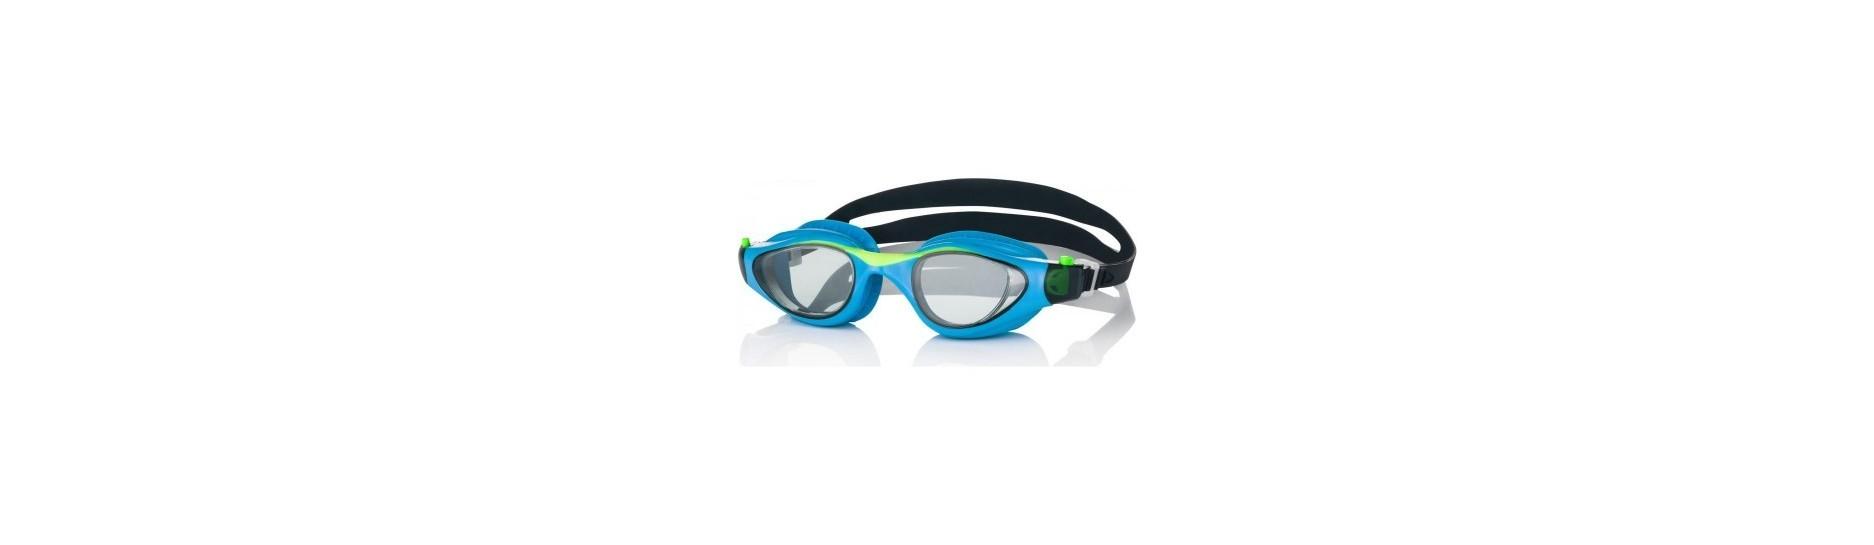 Jednodílné plavecké brýle